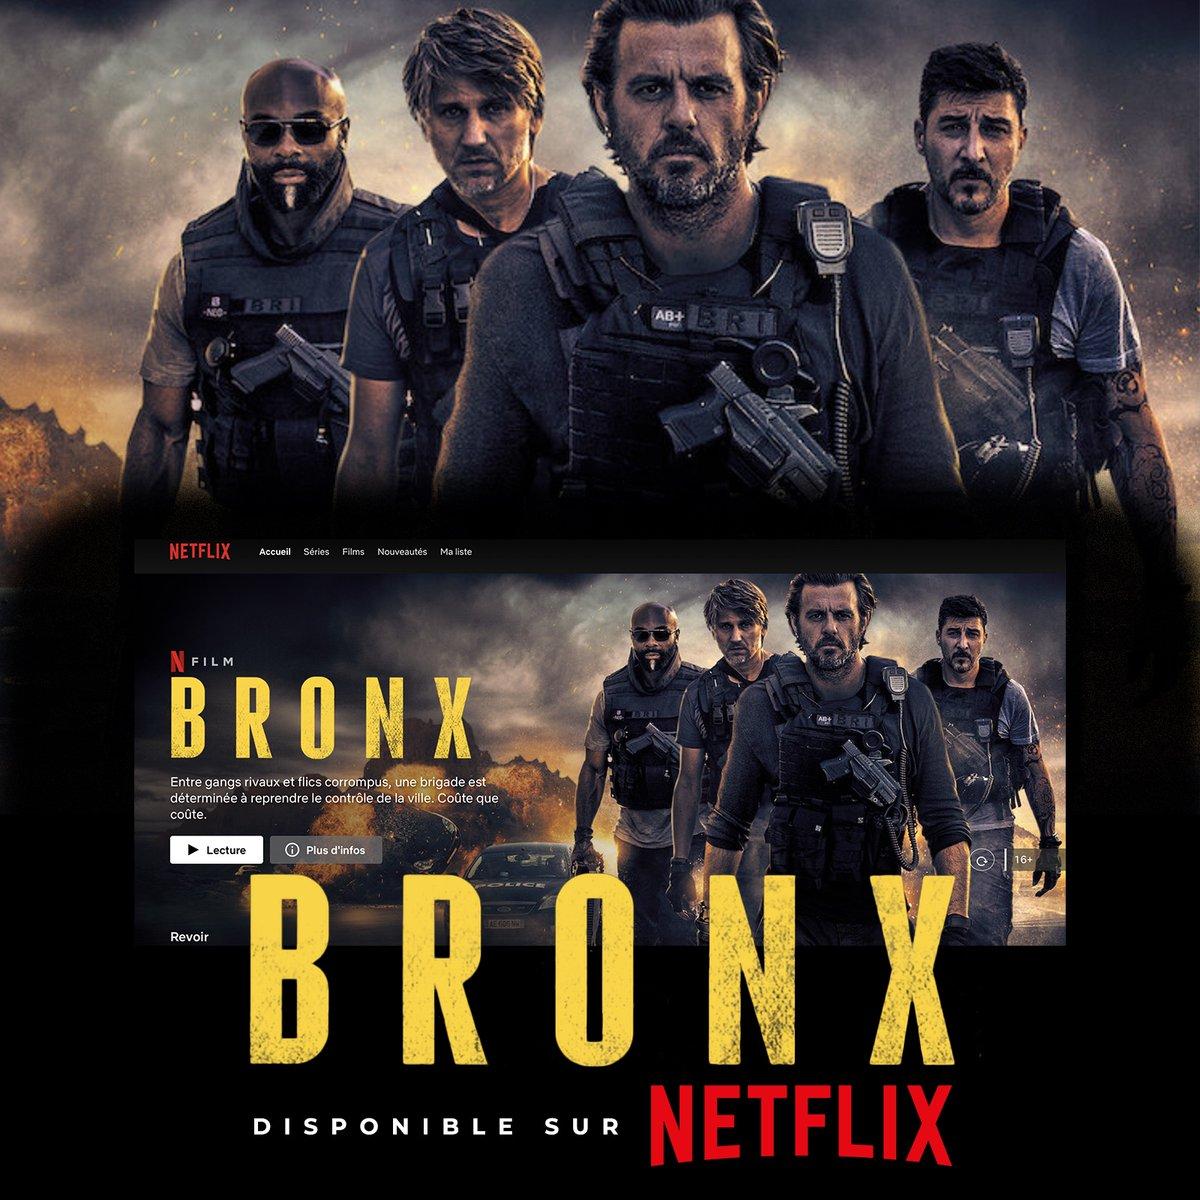 BRONX est disponible sur @NetflixFR  🔥🔥🔥🔥🔥🔥🔥🔥🔥🔥🔥 #bigkaaris #chefbandit #guerredesgangs #chaudbouillant #Bronx https://t.co/6GAjqpoYcc